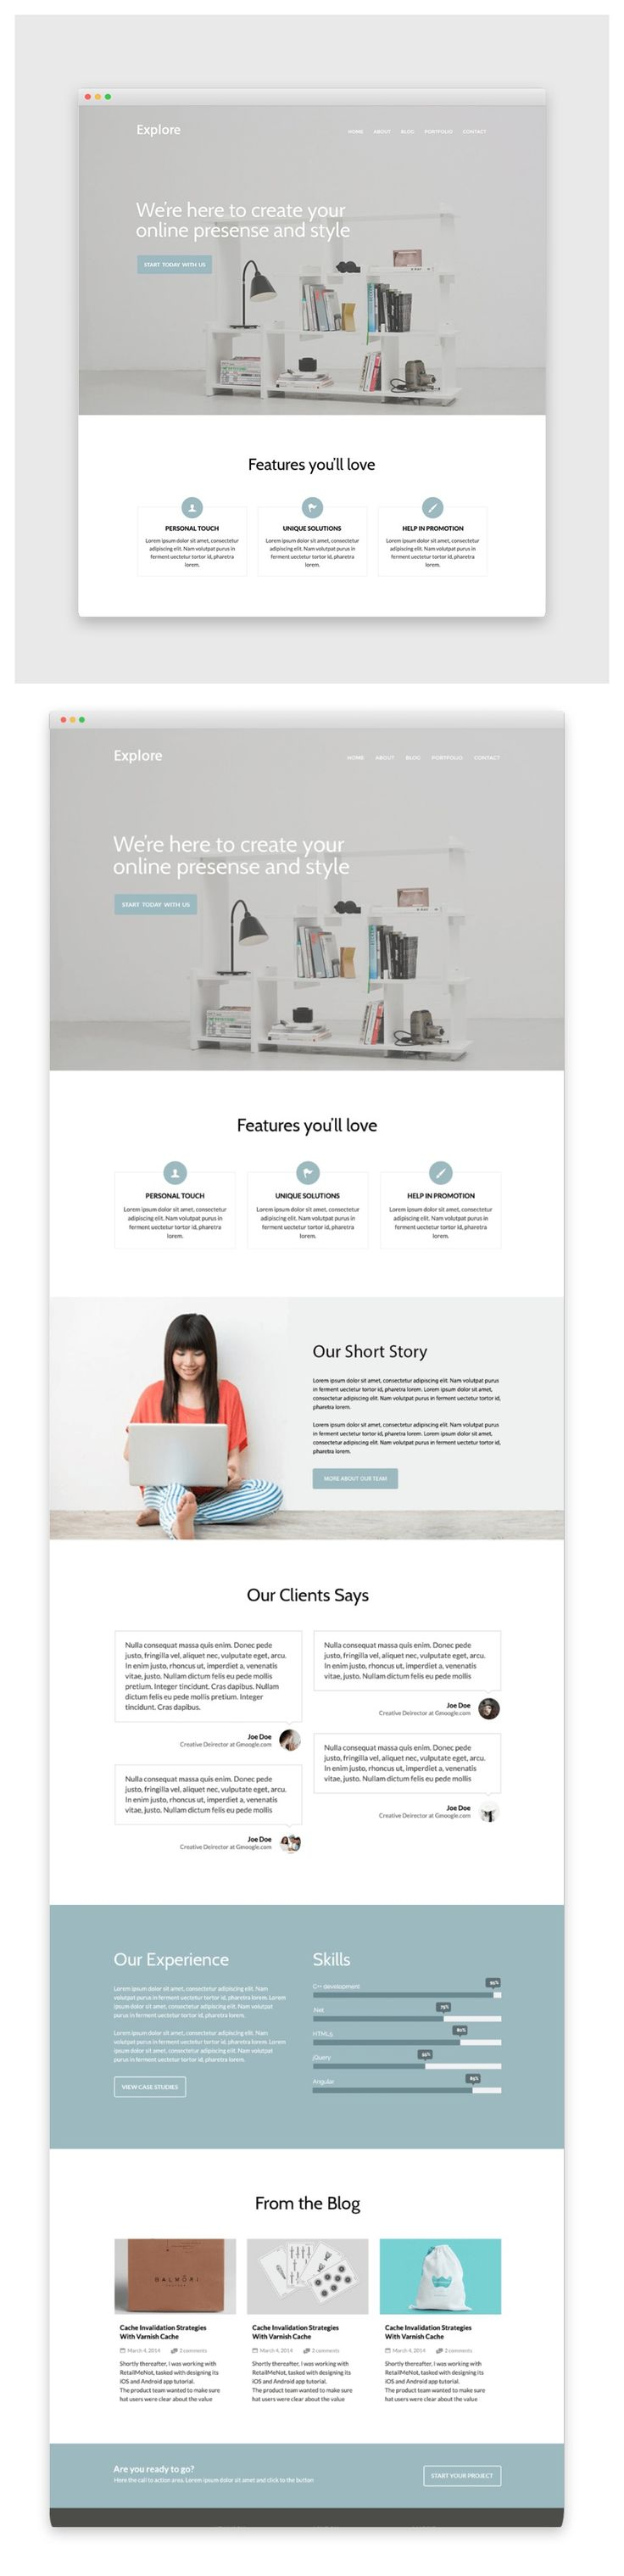 """Free Single Page #Web #Template #PSD"" | http://83oranges.com/free-single-page-web-template-psd/?utm_content=buffer1bec3&utm_medium=social&utm_source=pinterest.com&utm_campaign=buffer"